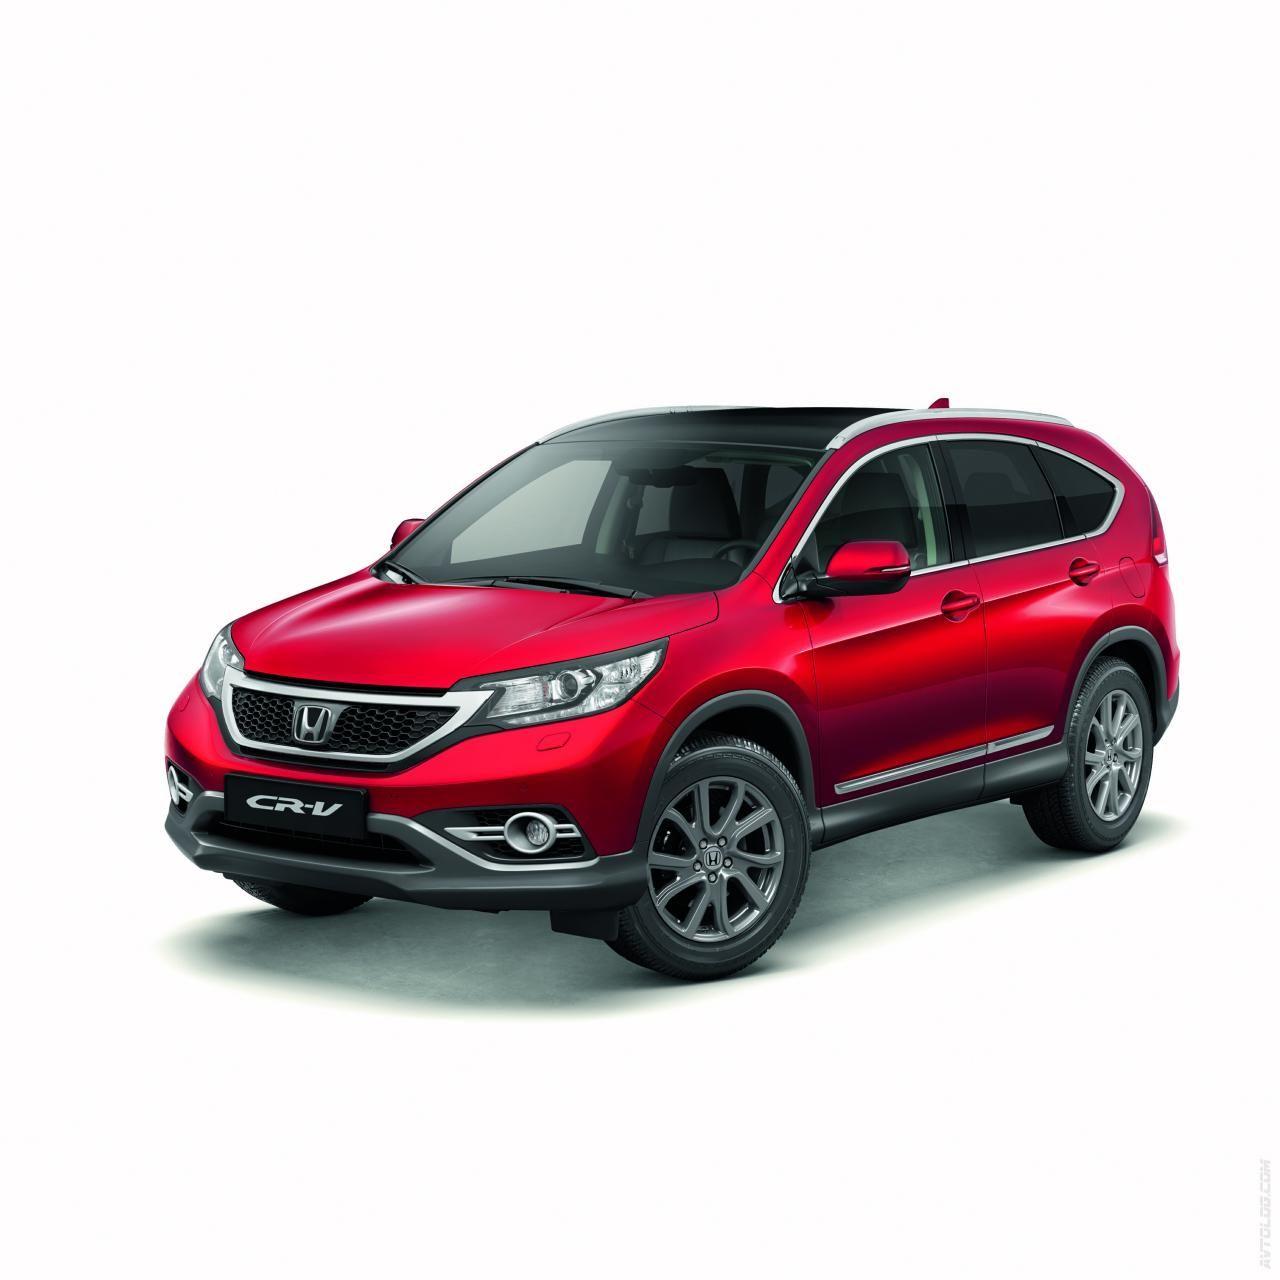 2013 Honda CRV EU Version 2013 honda, Honda dealership